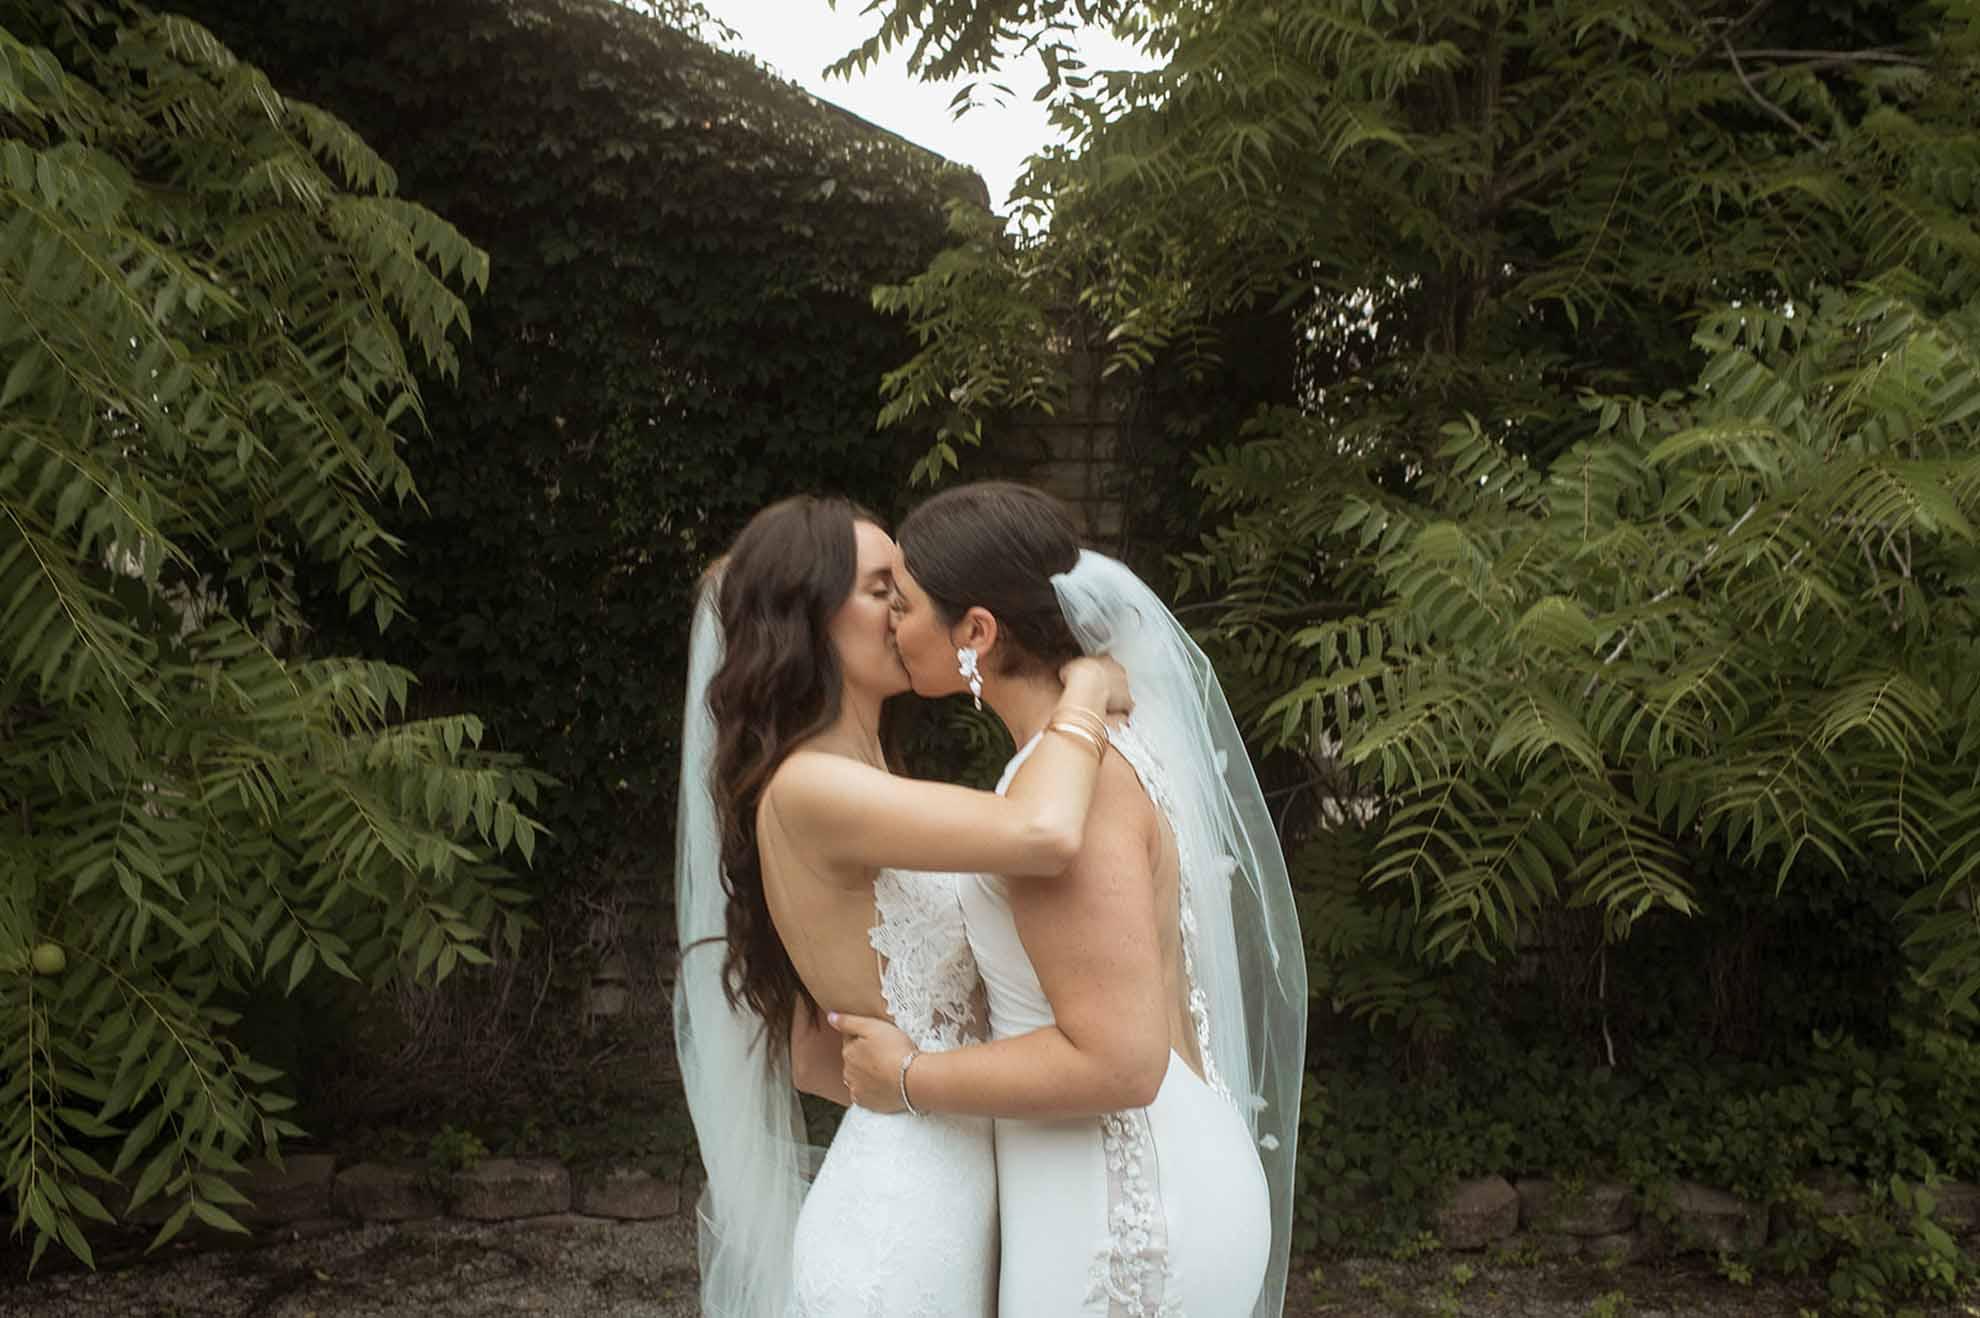 Jennifer Moher photographer Toronto Canada lesbian same-sex gay wedding Dancing With Her LGBTQIA magazine